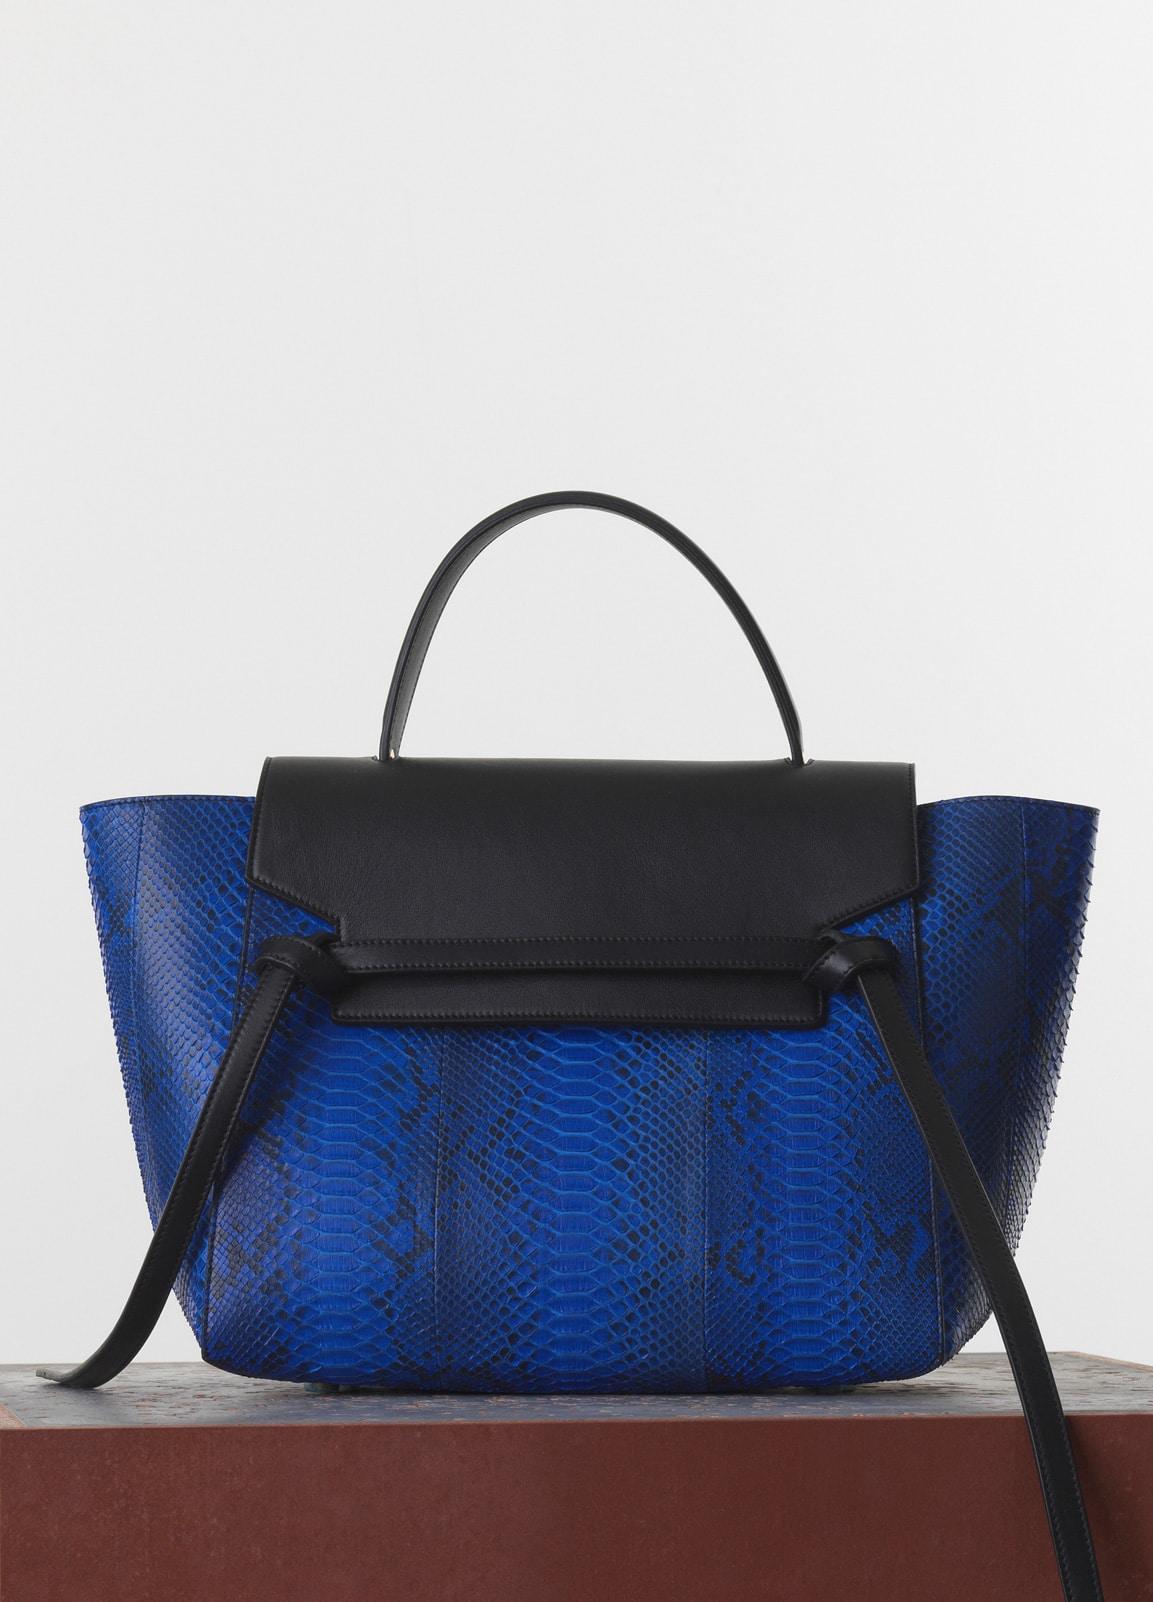 celine mini pink - Celine Belt Tote Bag Reference Guide featuring Top Handle ...